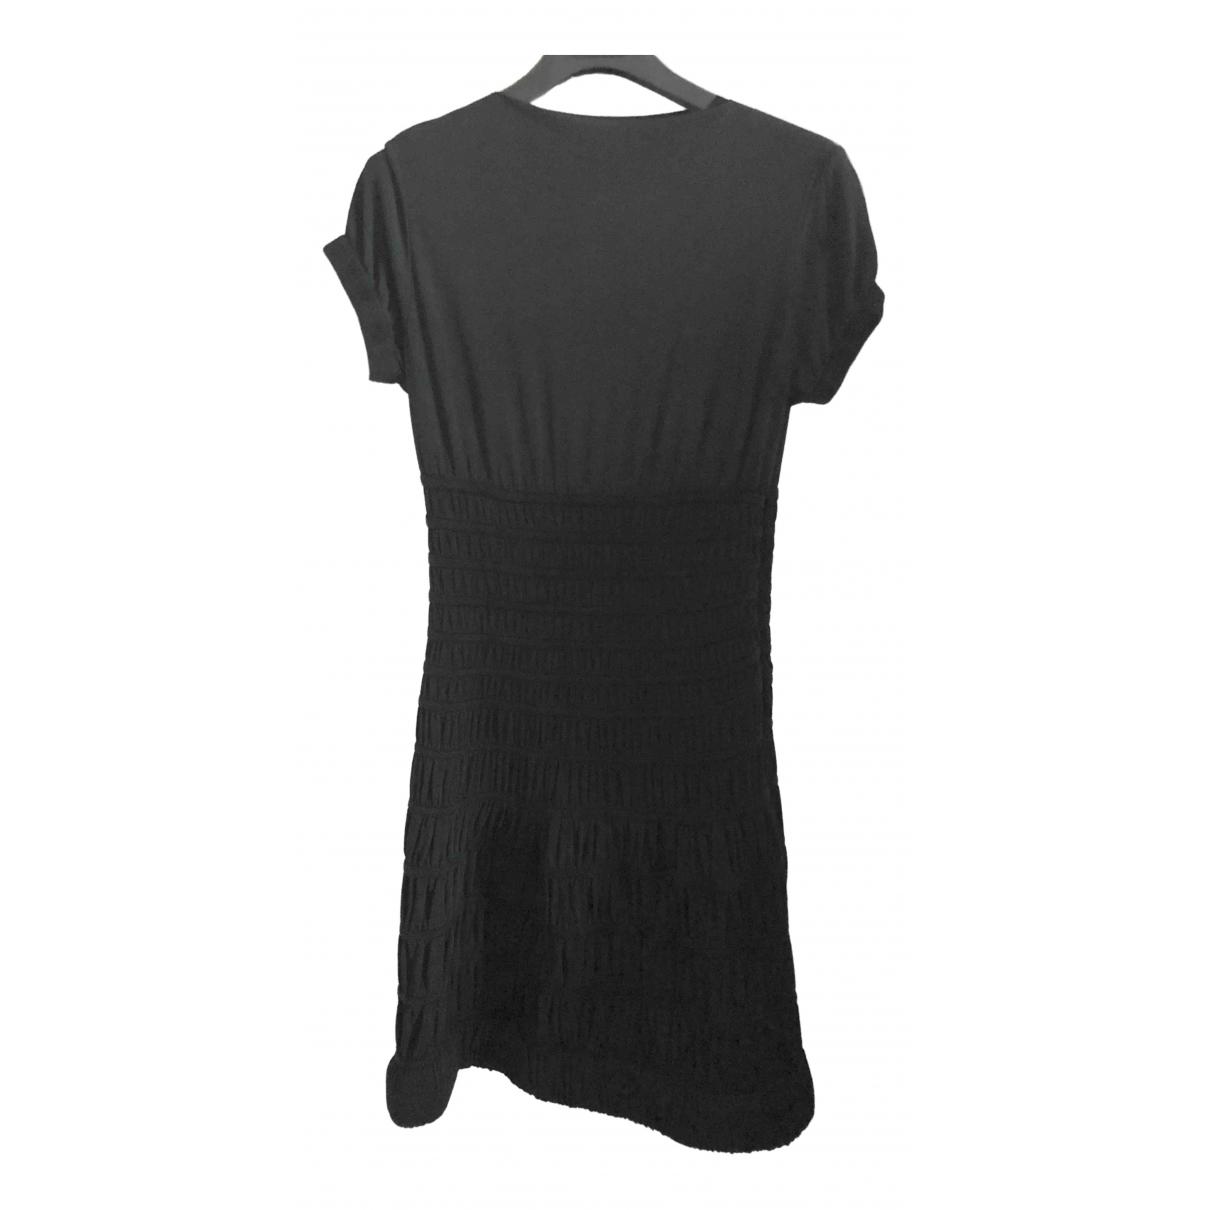 Alaïa \N Black dress for Women M International